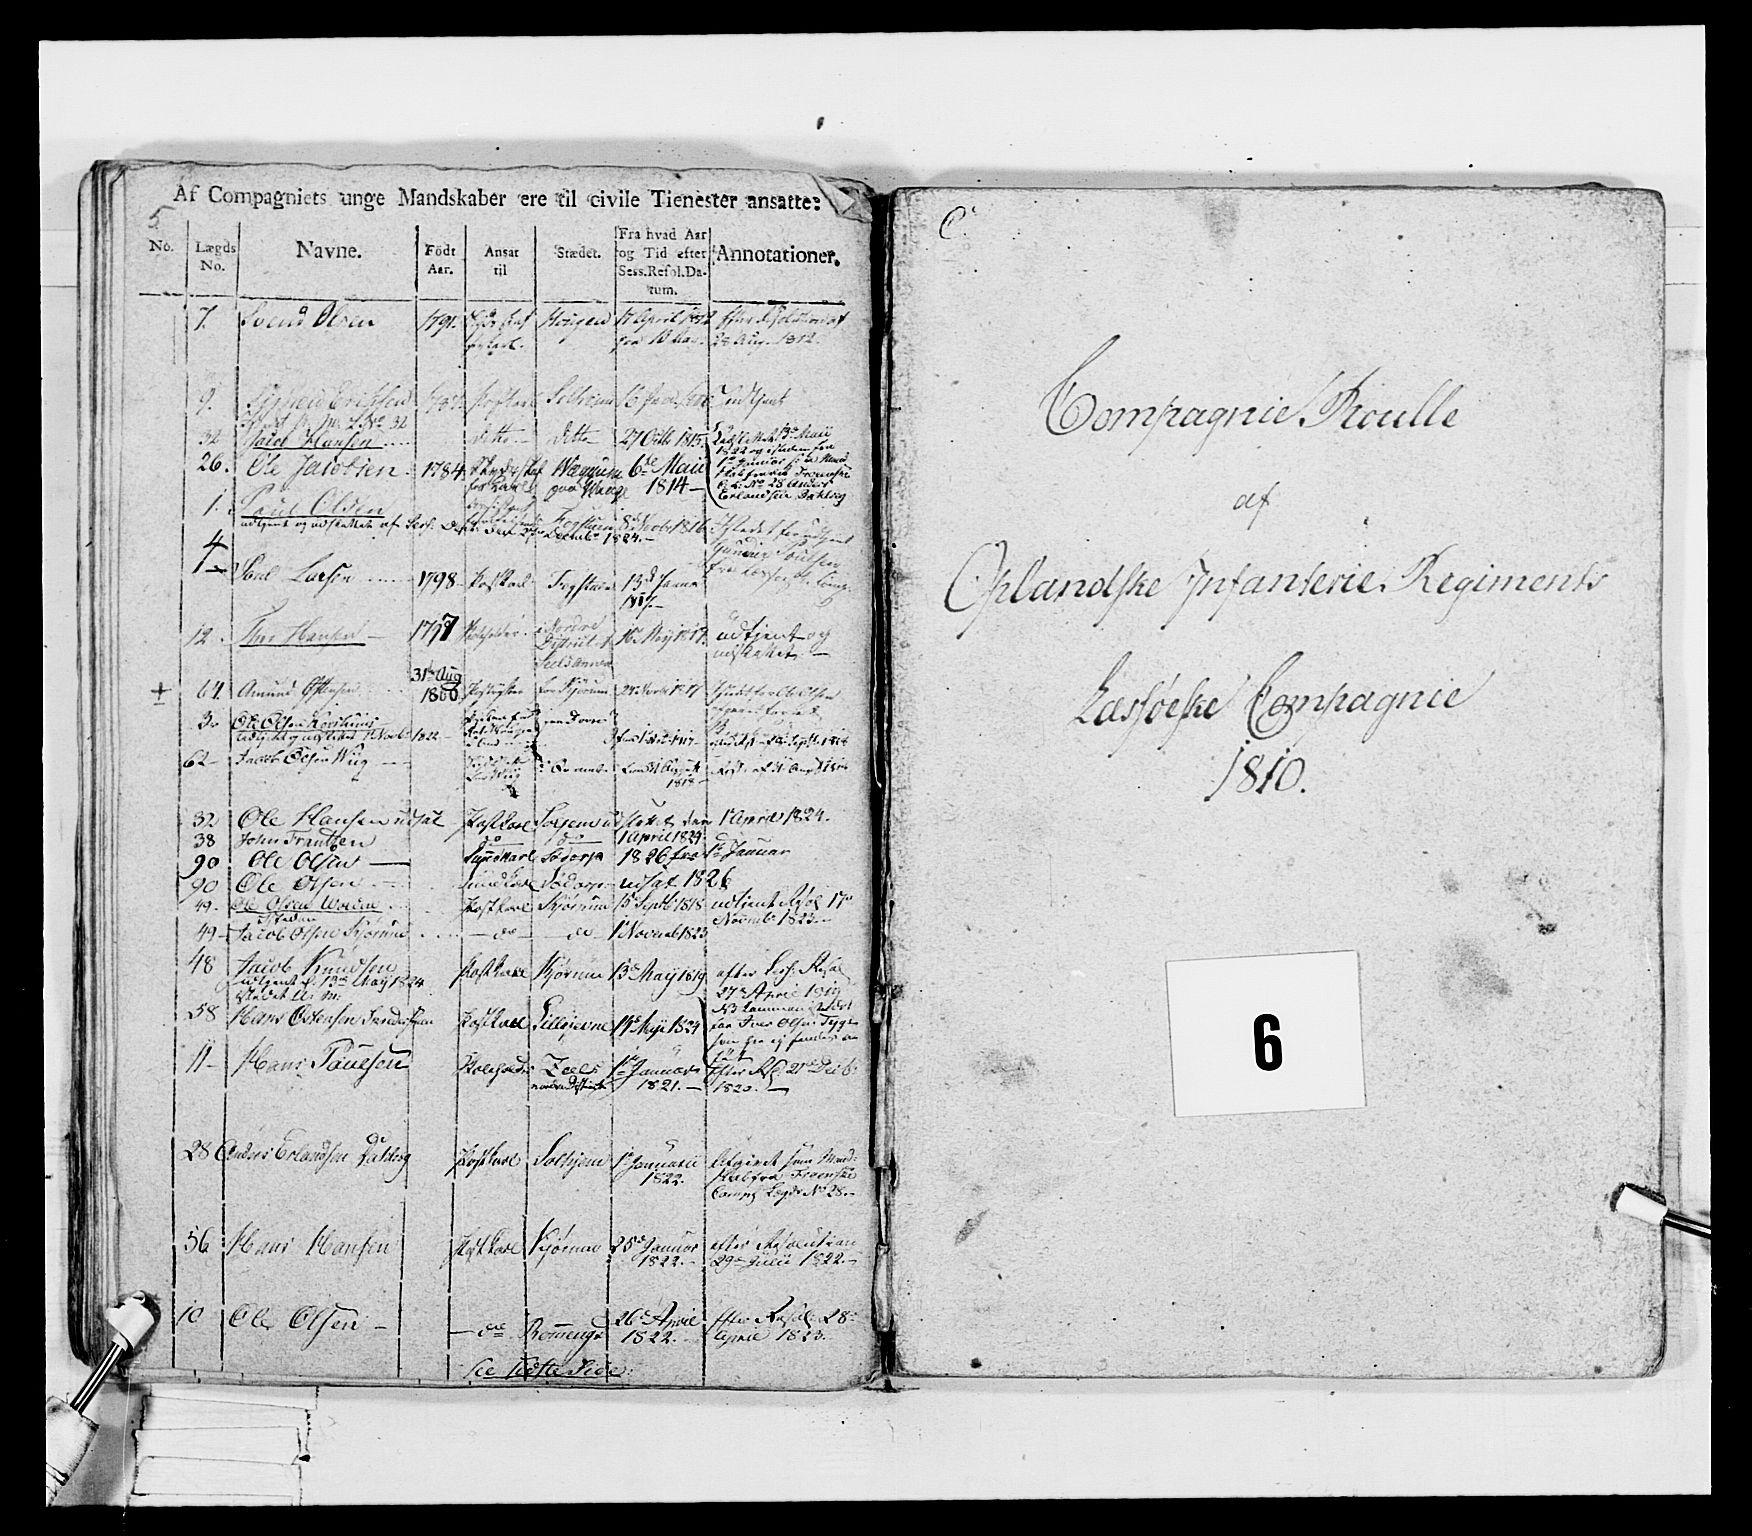 RA, Generalitets- og kommissariatskollegiet, Det kongelige norske kommissariatskollegium, E/Eh/L0069: Opplandske gevorbne infanteriregiment, 1810-1818, s. 267